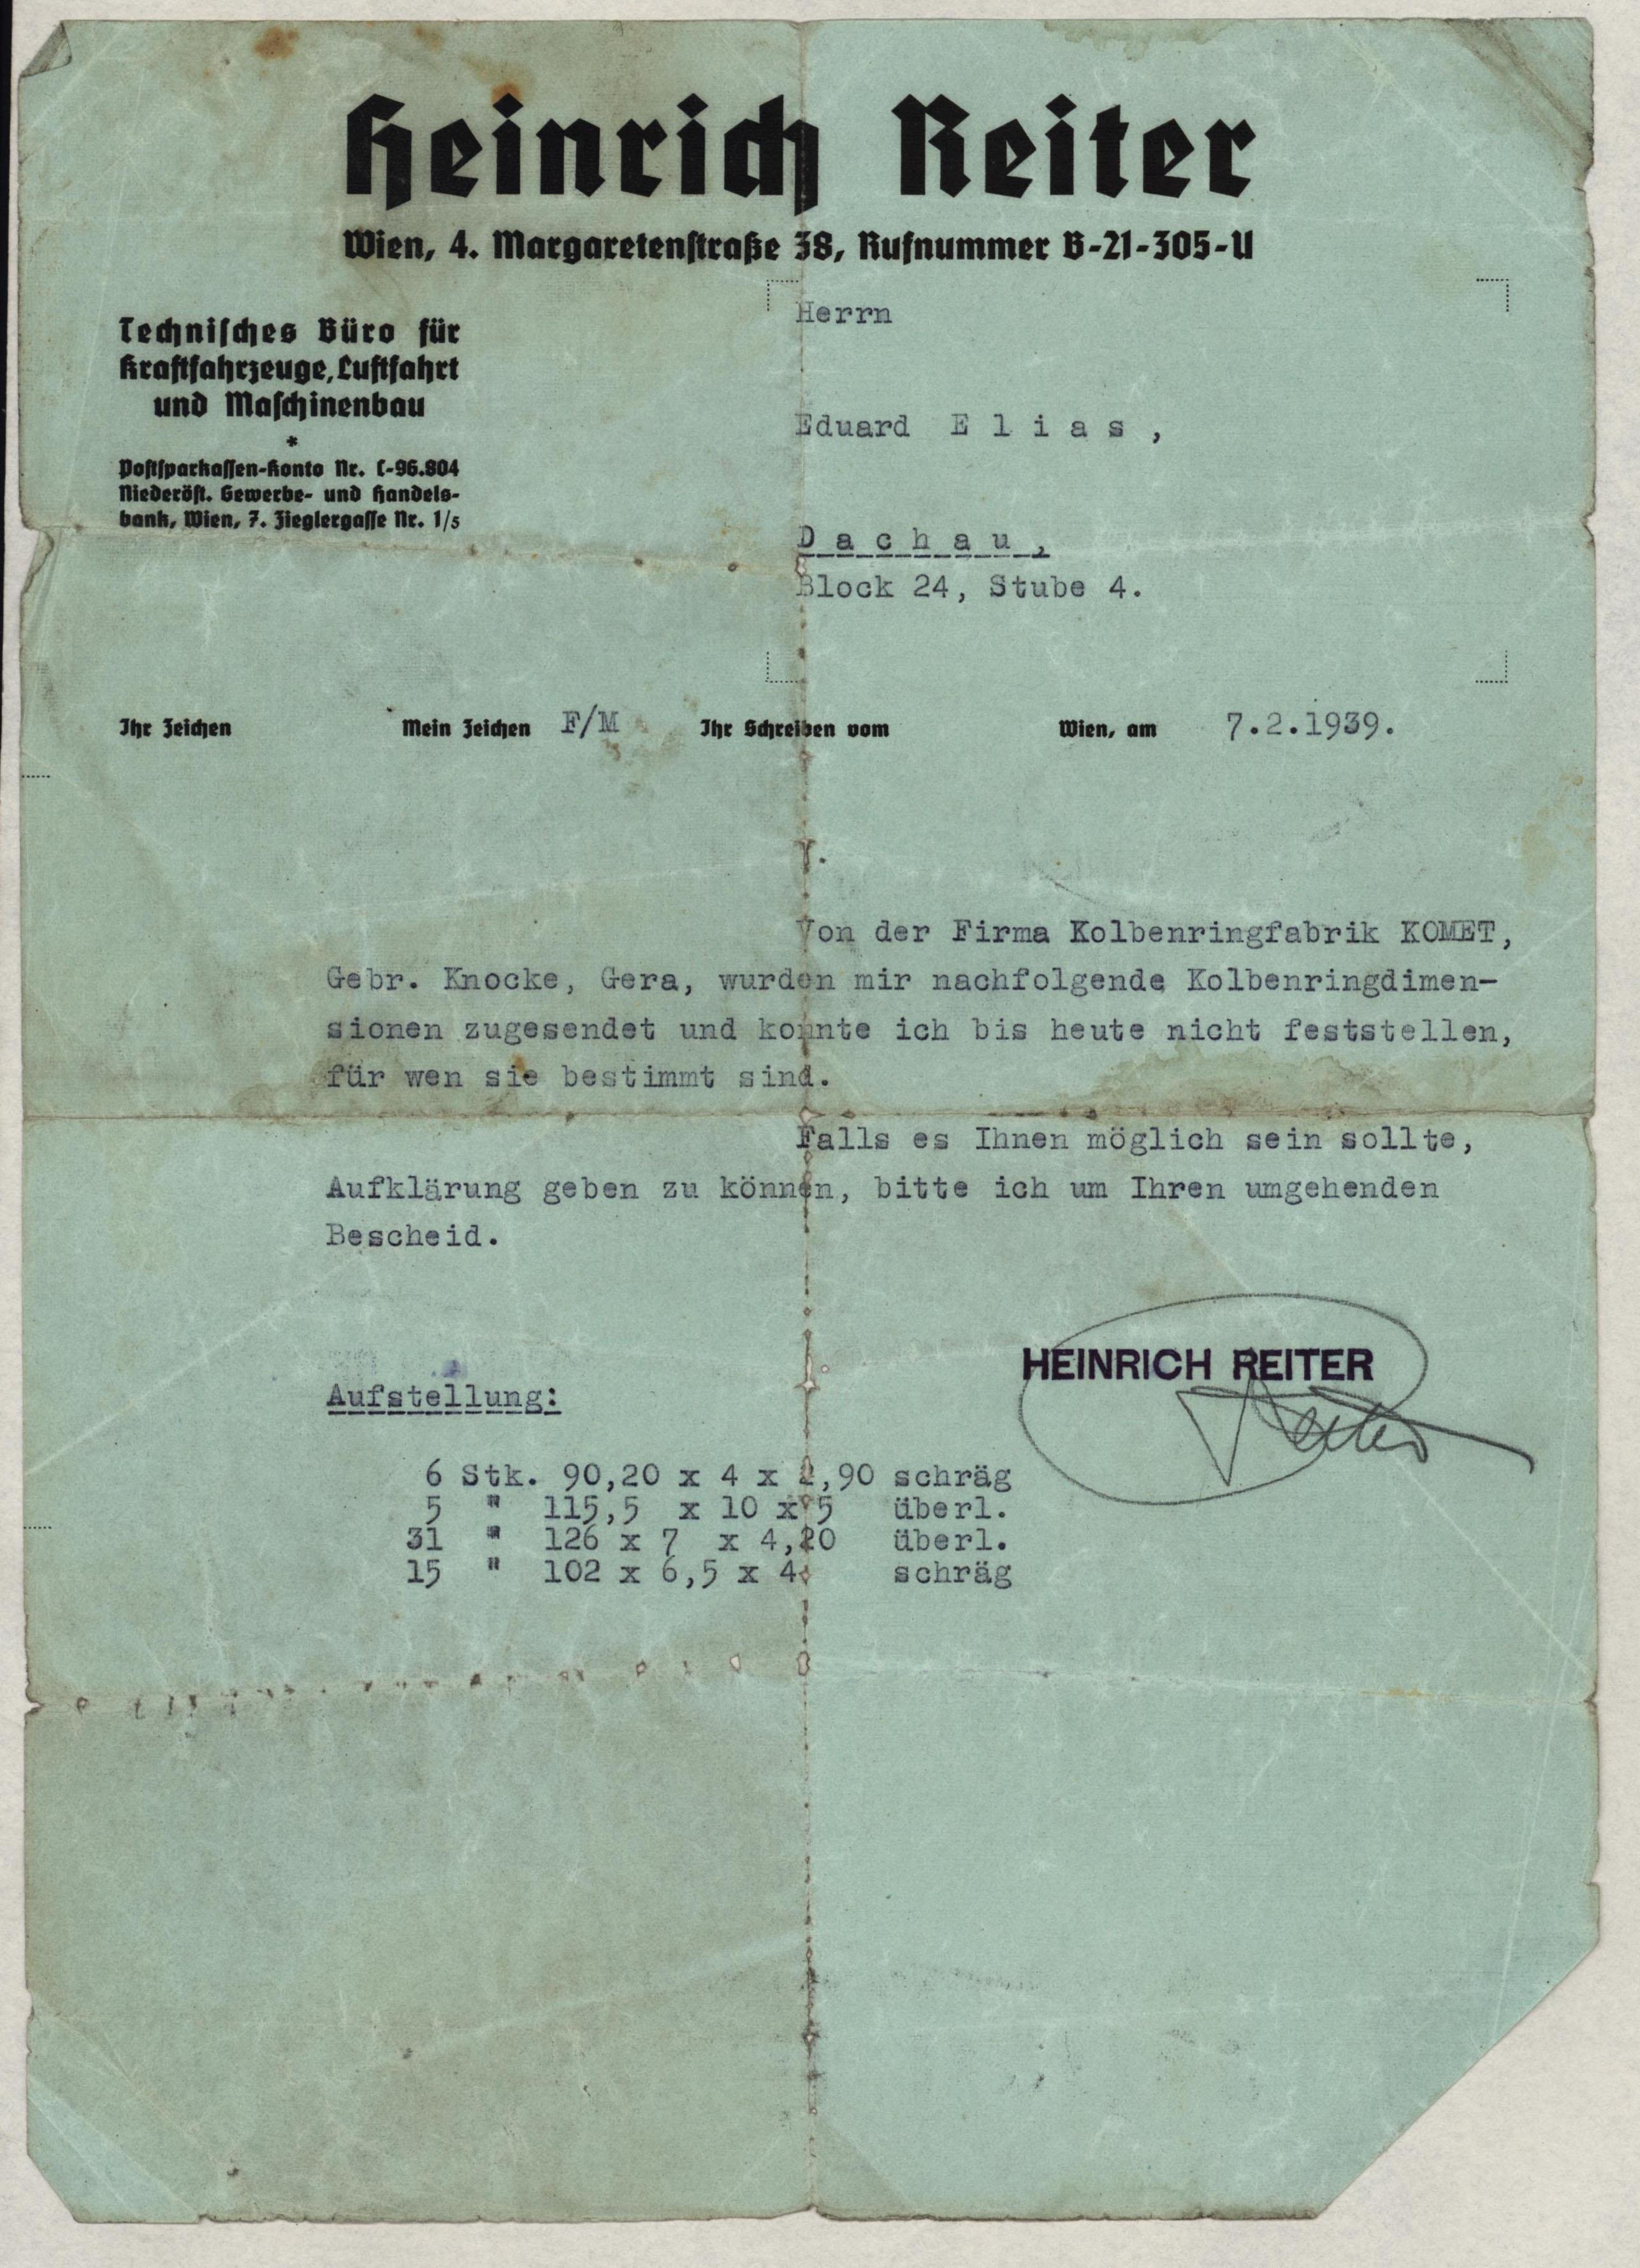 Eduard Elias – Letters – Kitchener Camp